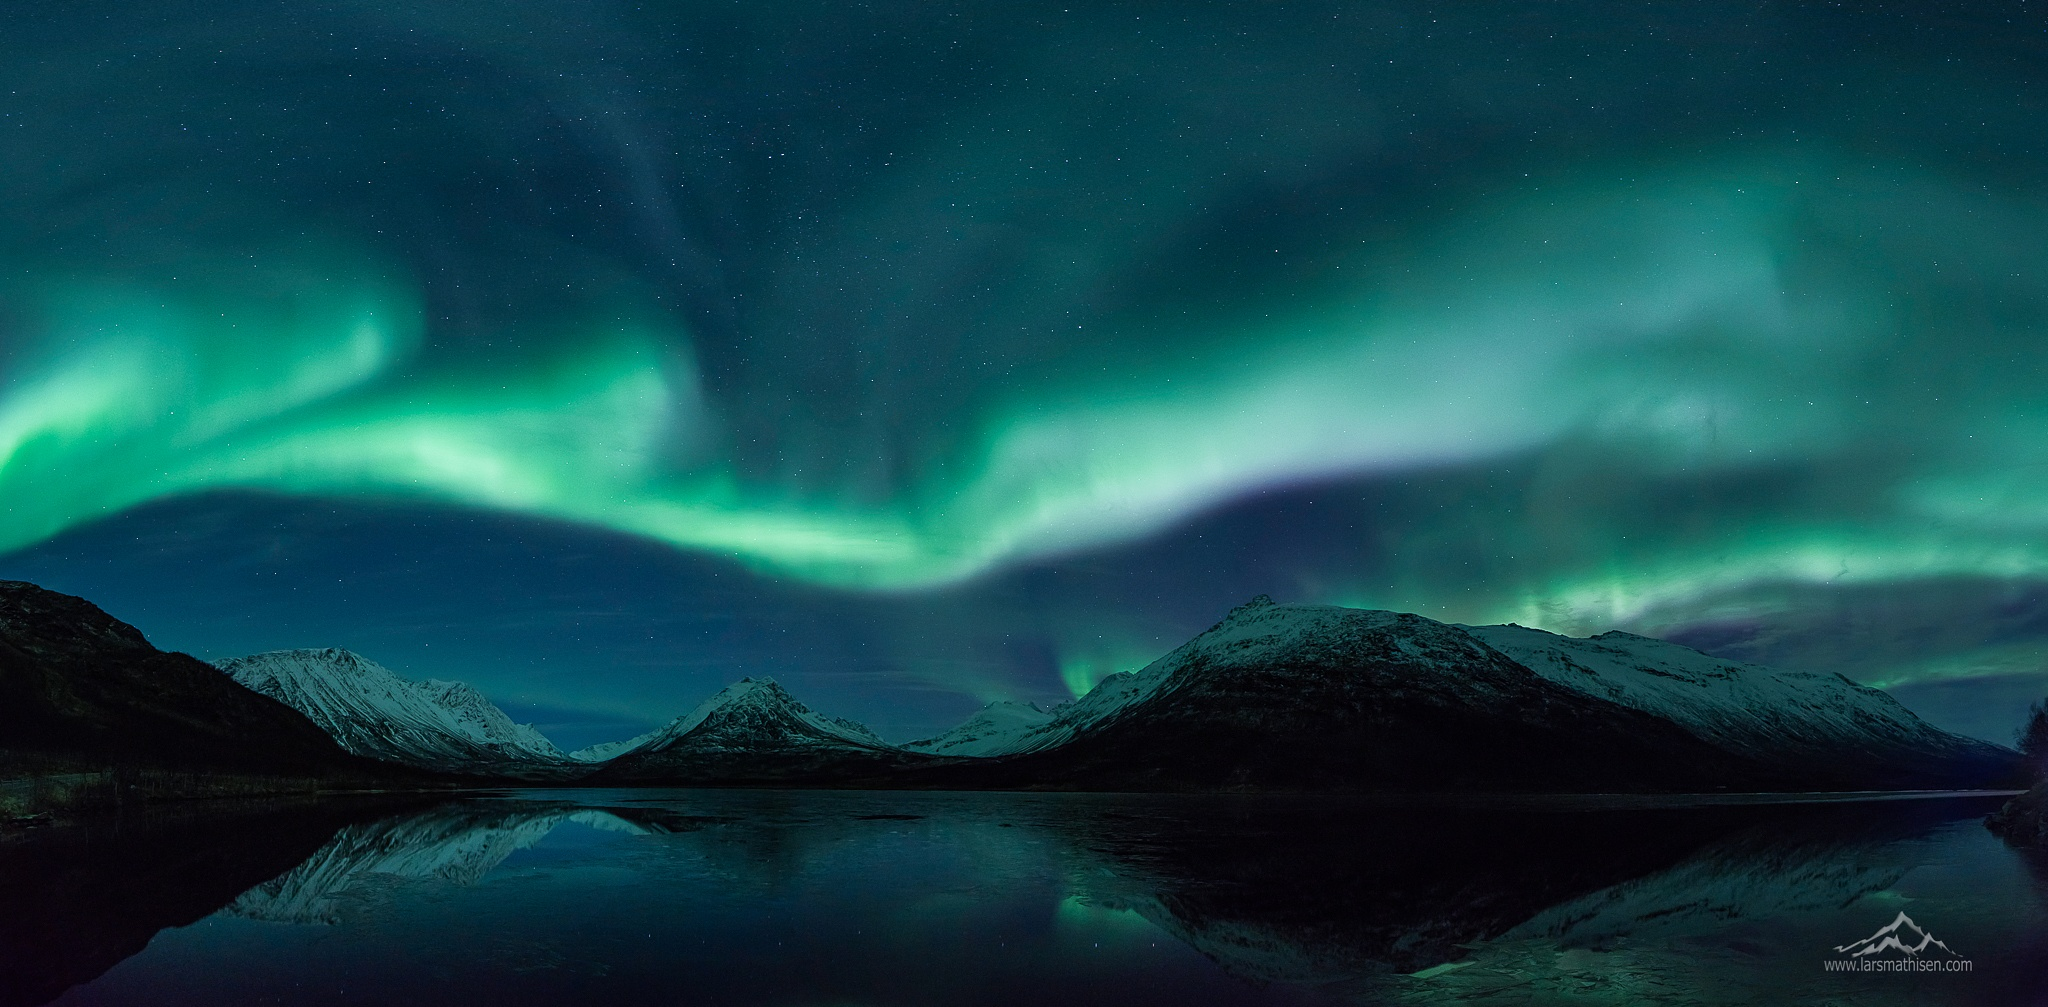 Nightlight by LarsMathisen